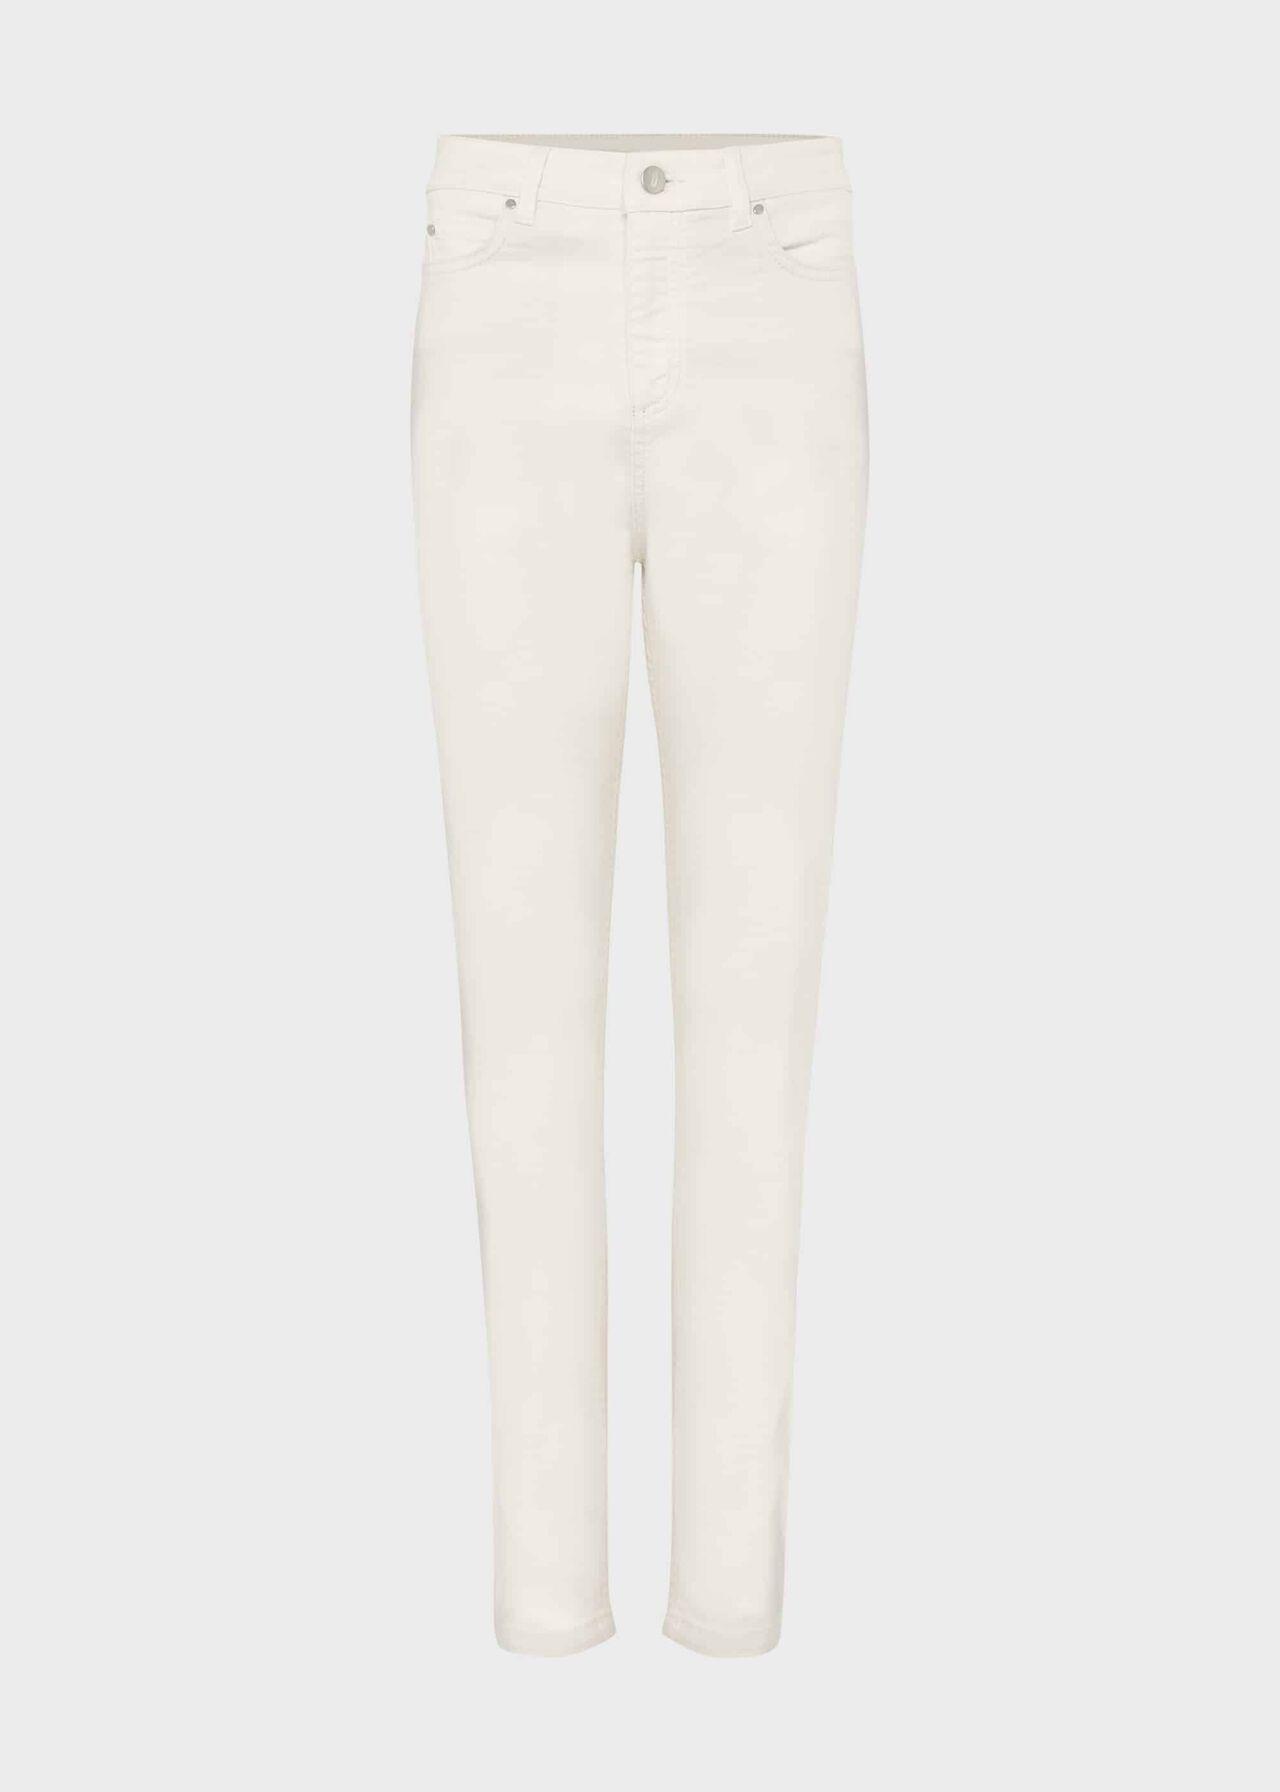 Gia Sculpting Jeans, White, hi-res